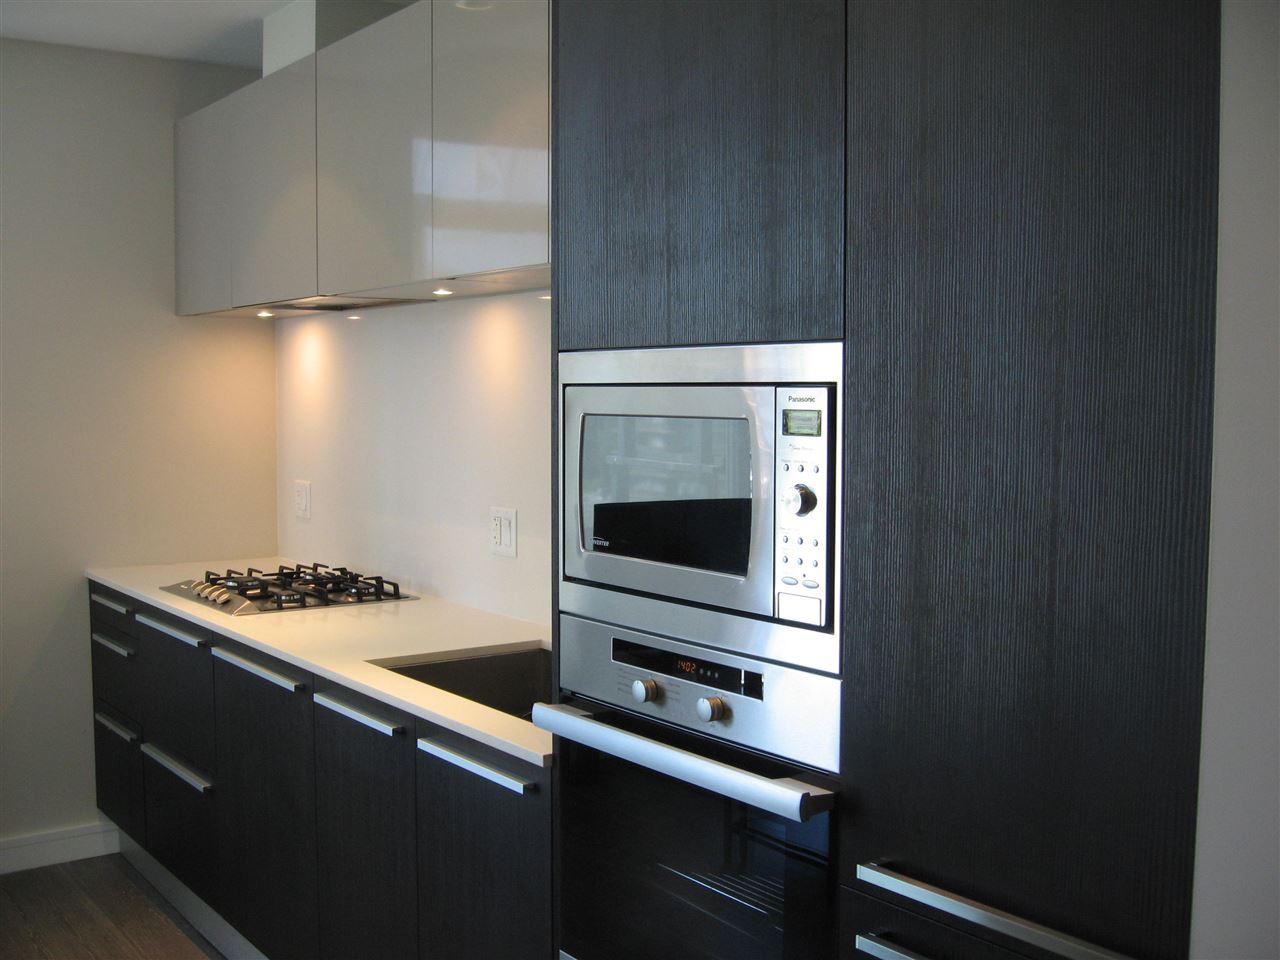 Condo Apartment at 904 1221 BIDWELL STREET, Unit 904, Vancouver West, British Columbia. Image 2